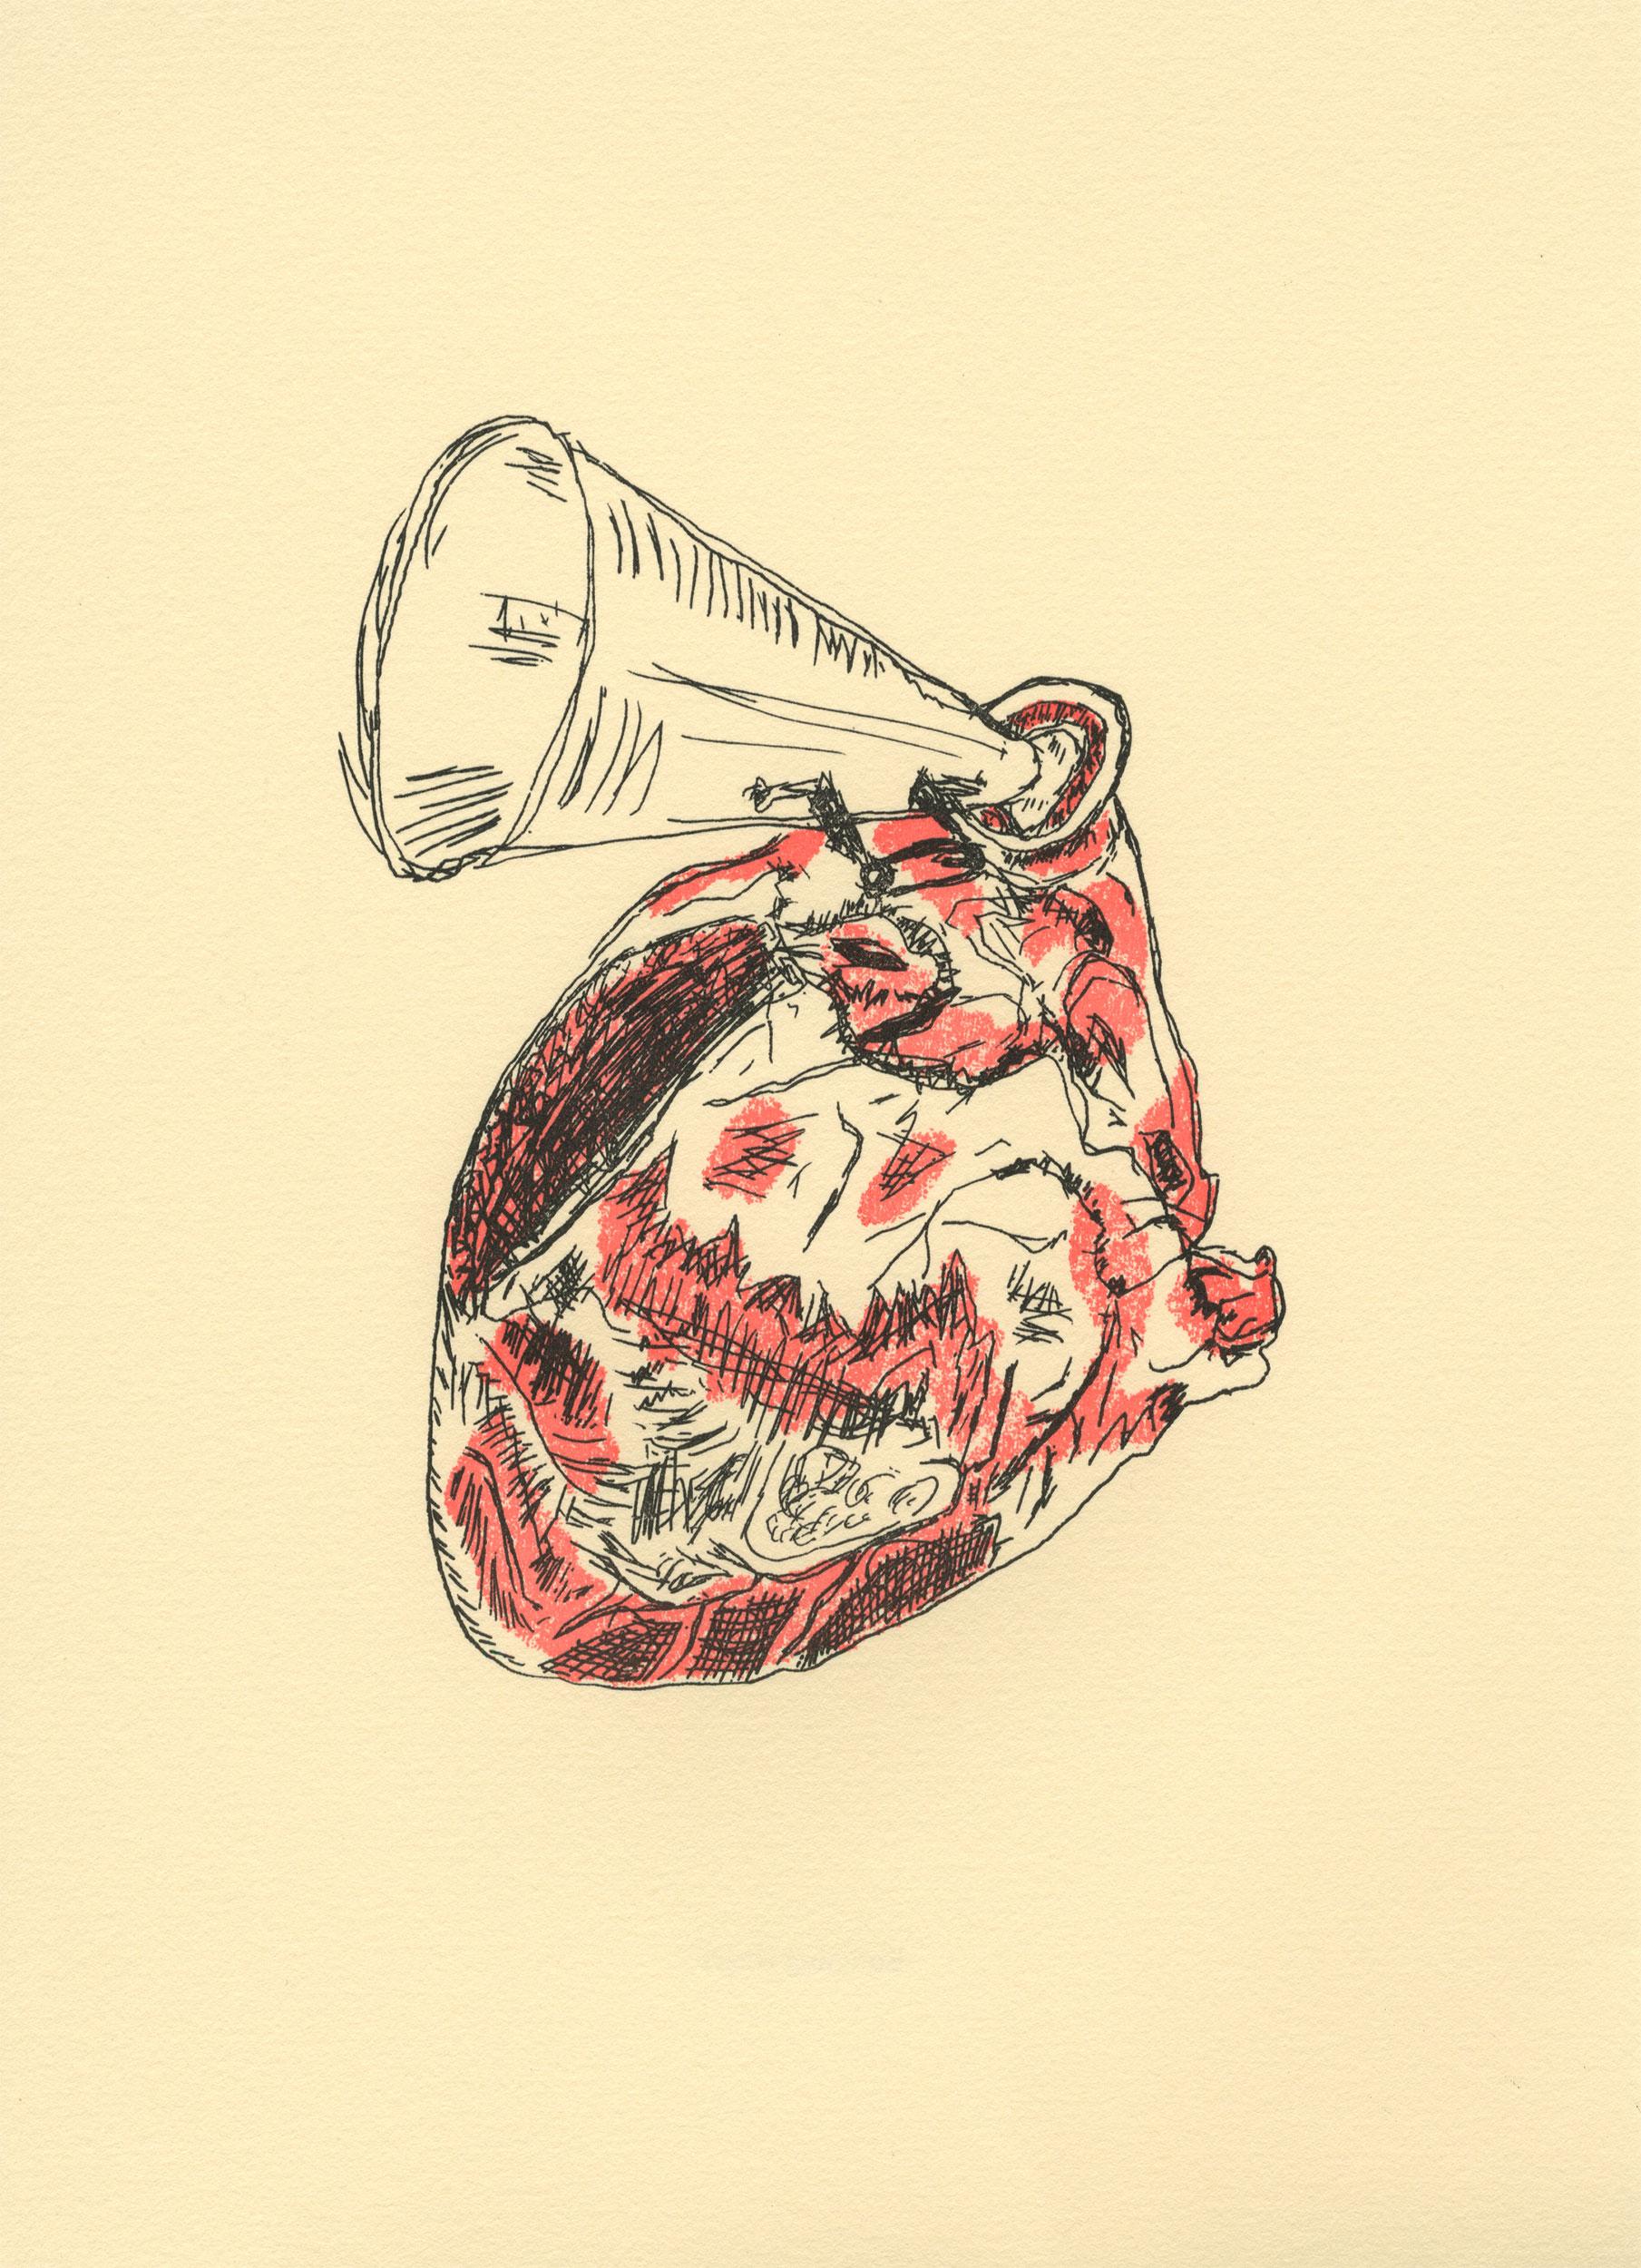 Booming Heart